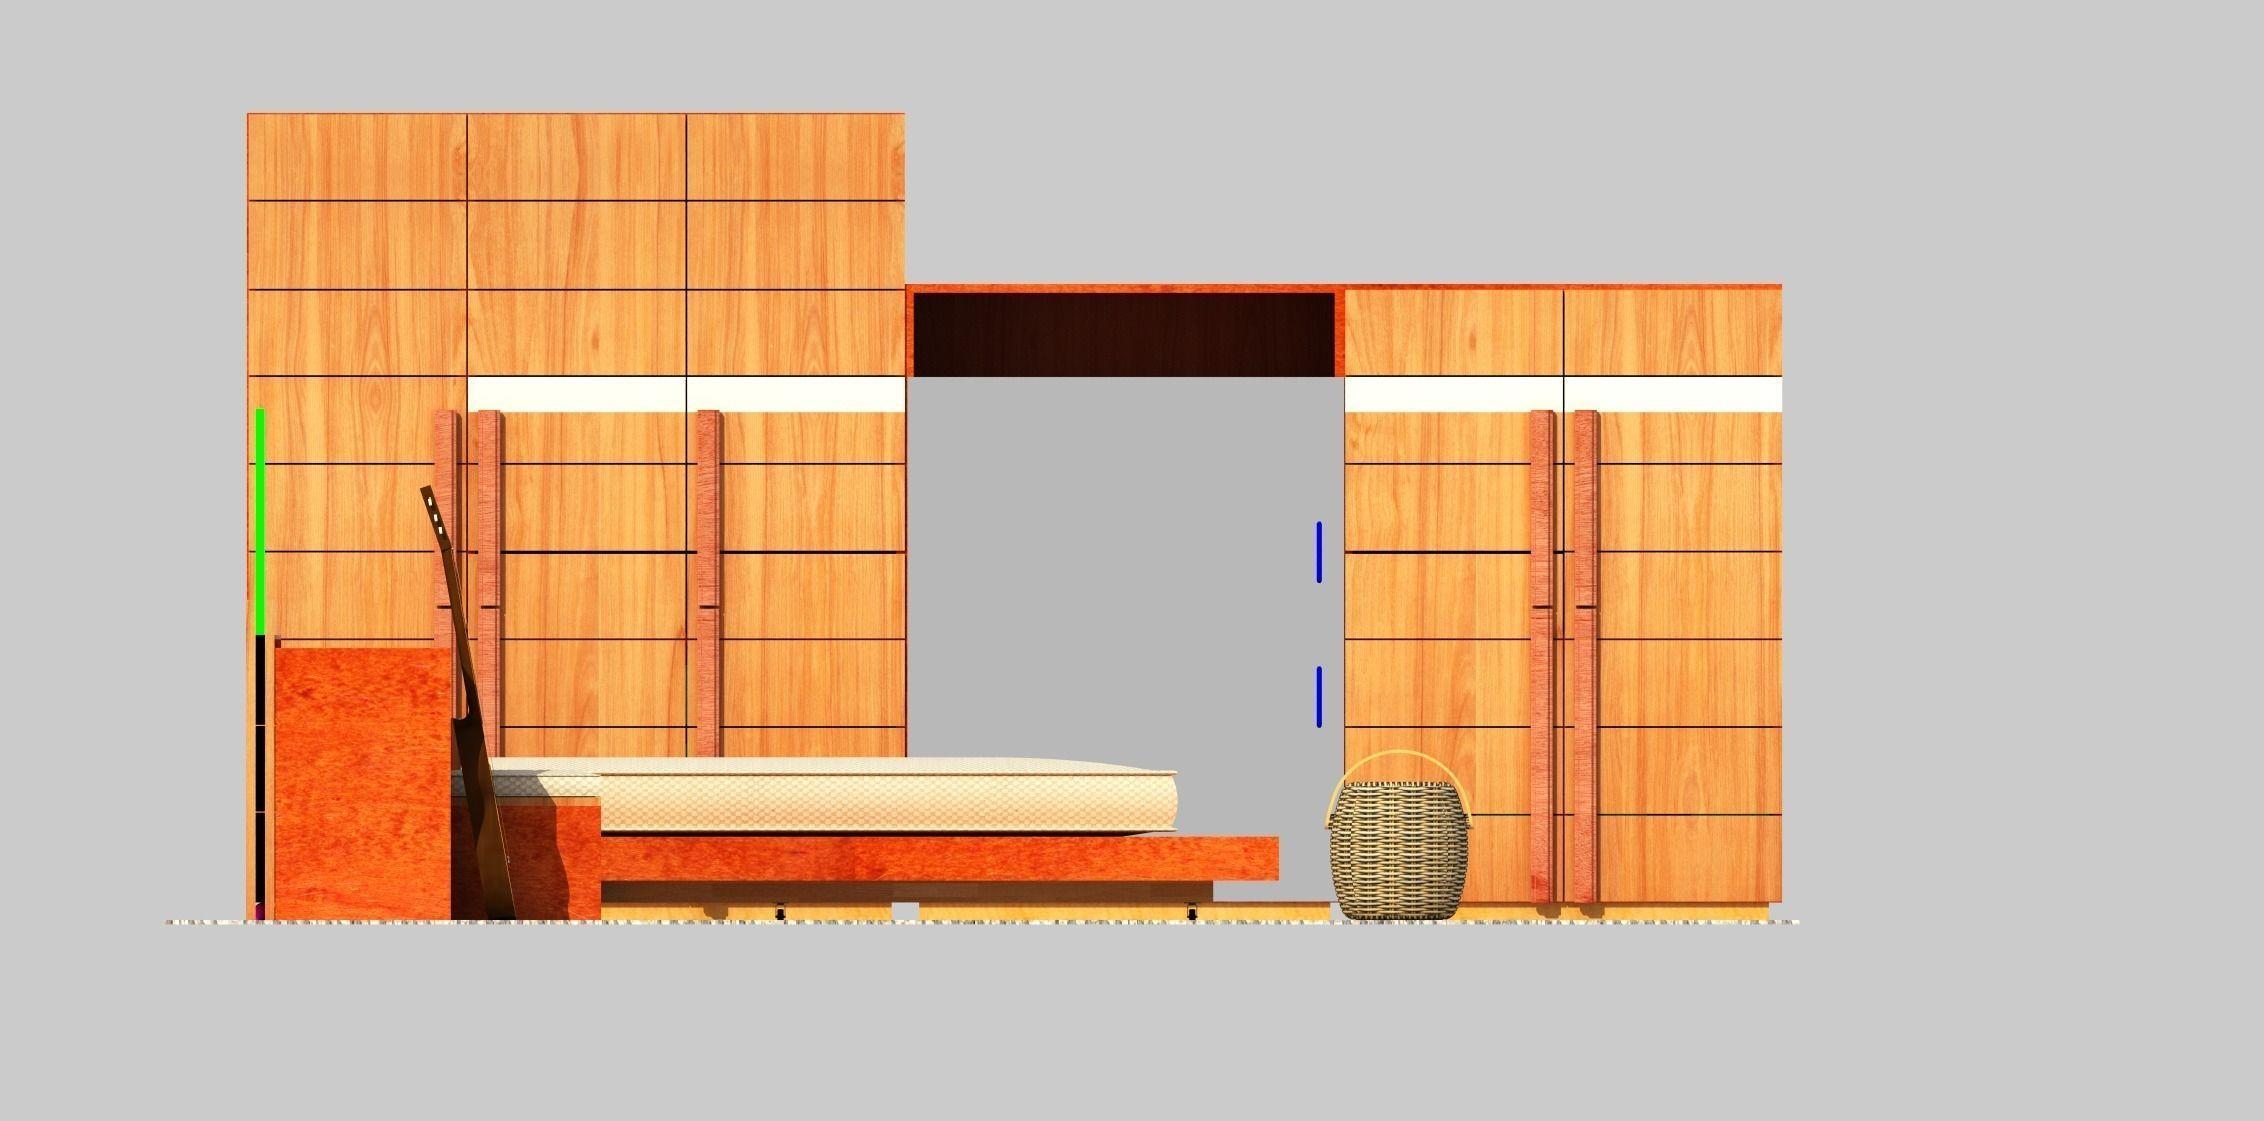 Bedroom Furniture 3d Models 3d model the bedroom furniture vr / ar / low-poly animated 3ds c4d